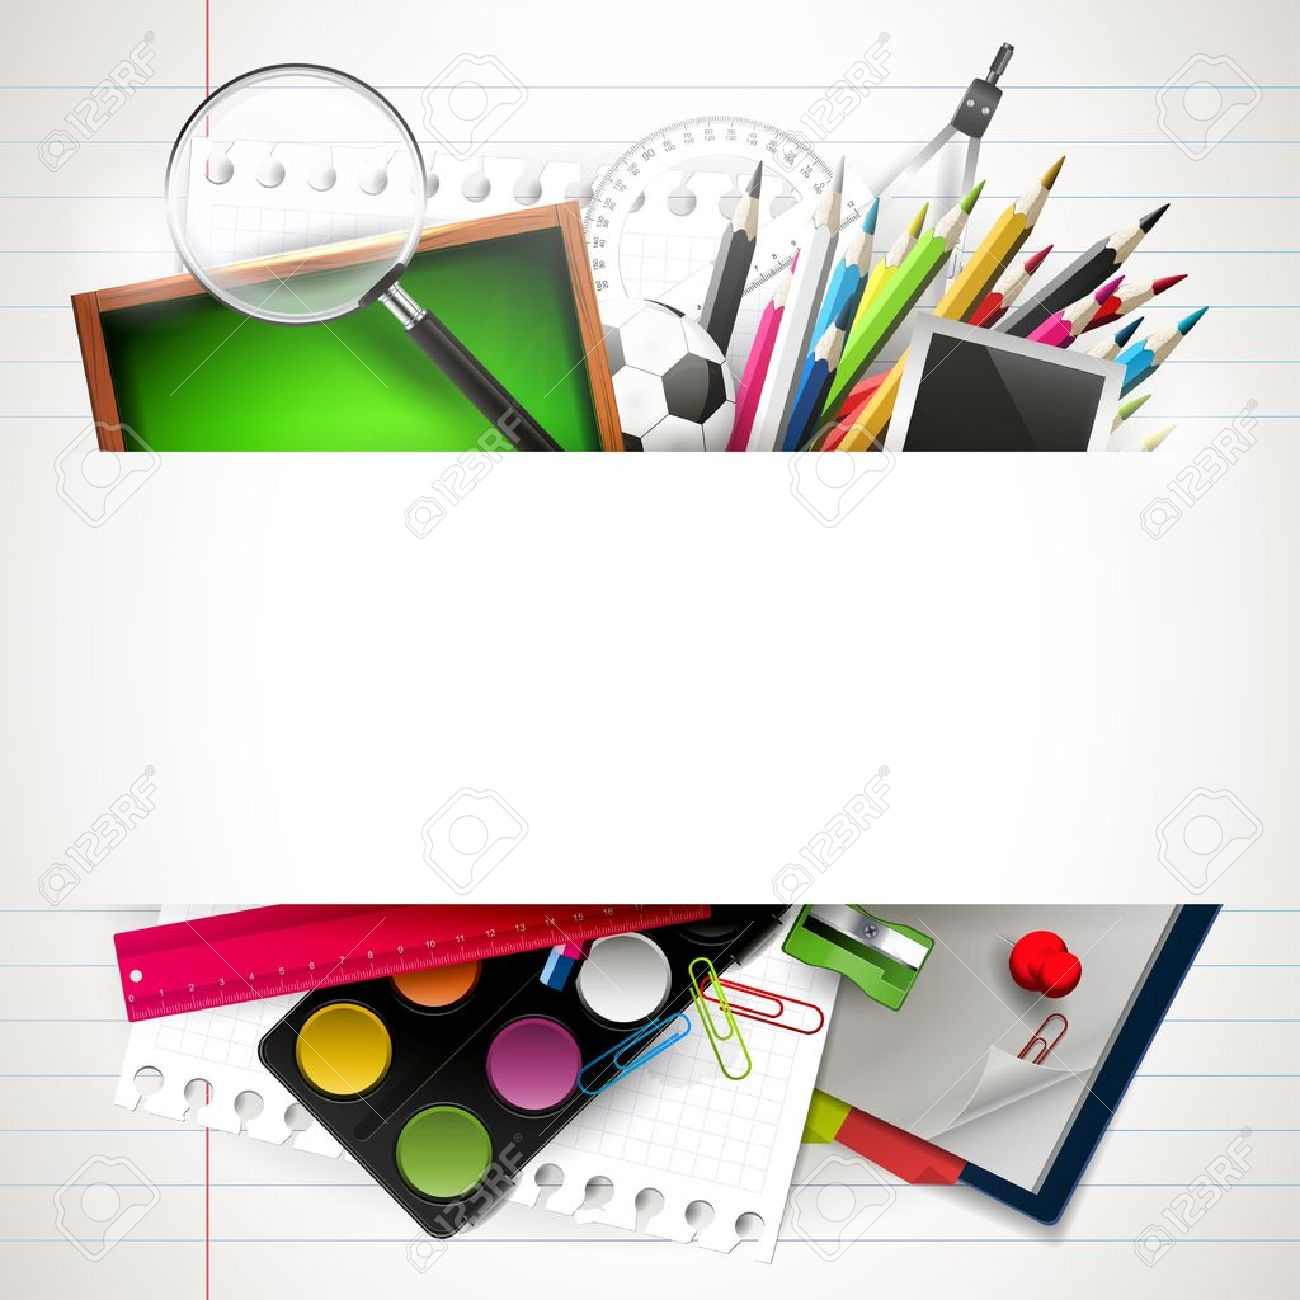 School background with school supplies and copyspace Stock Vector - 21180188